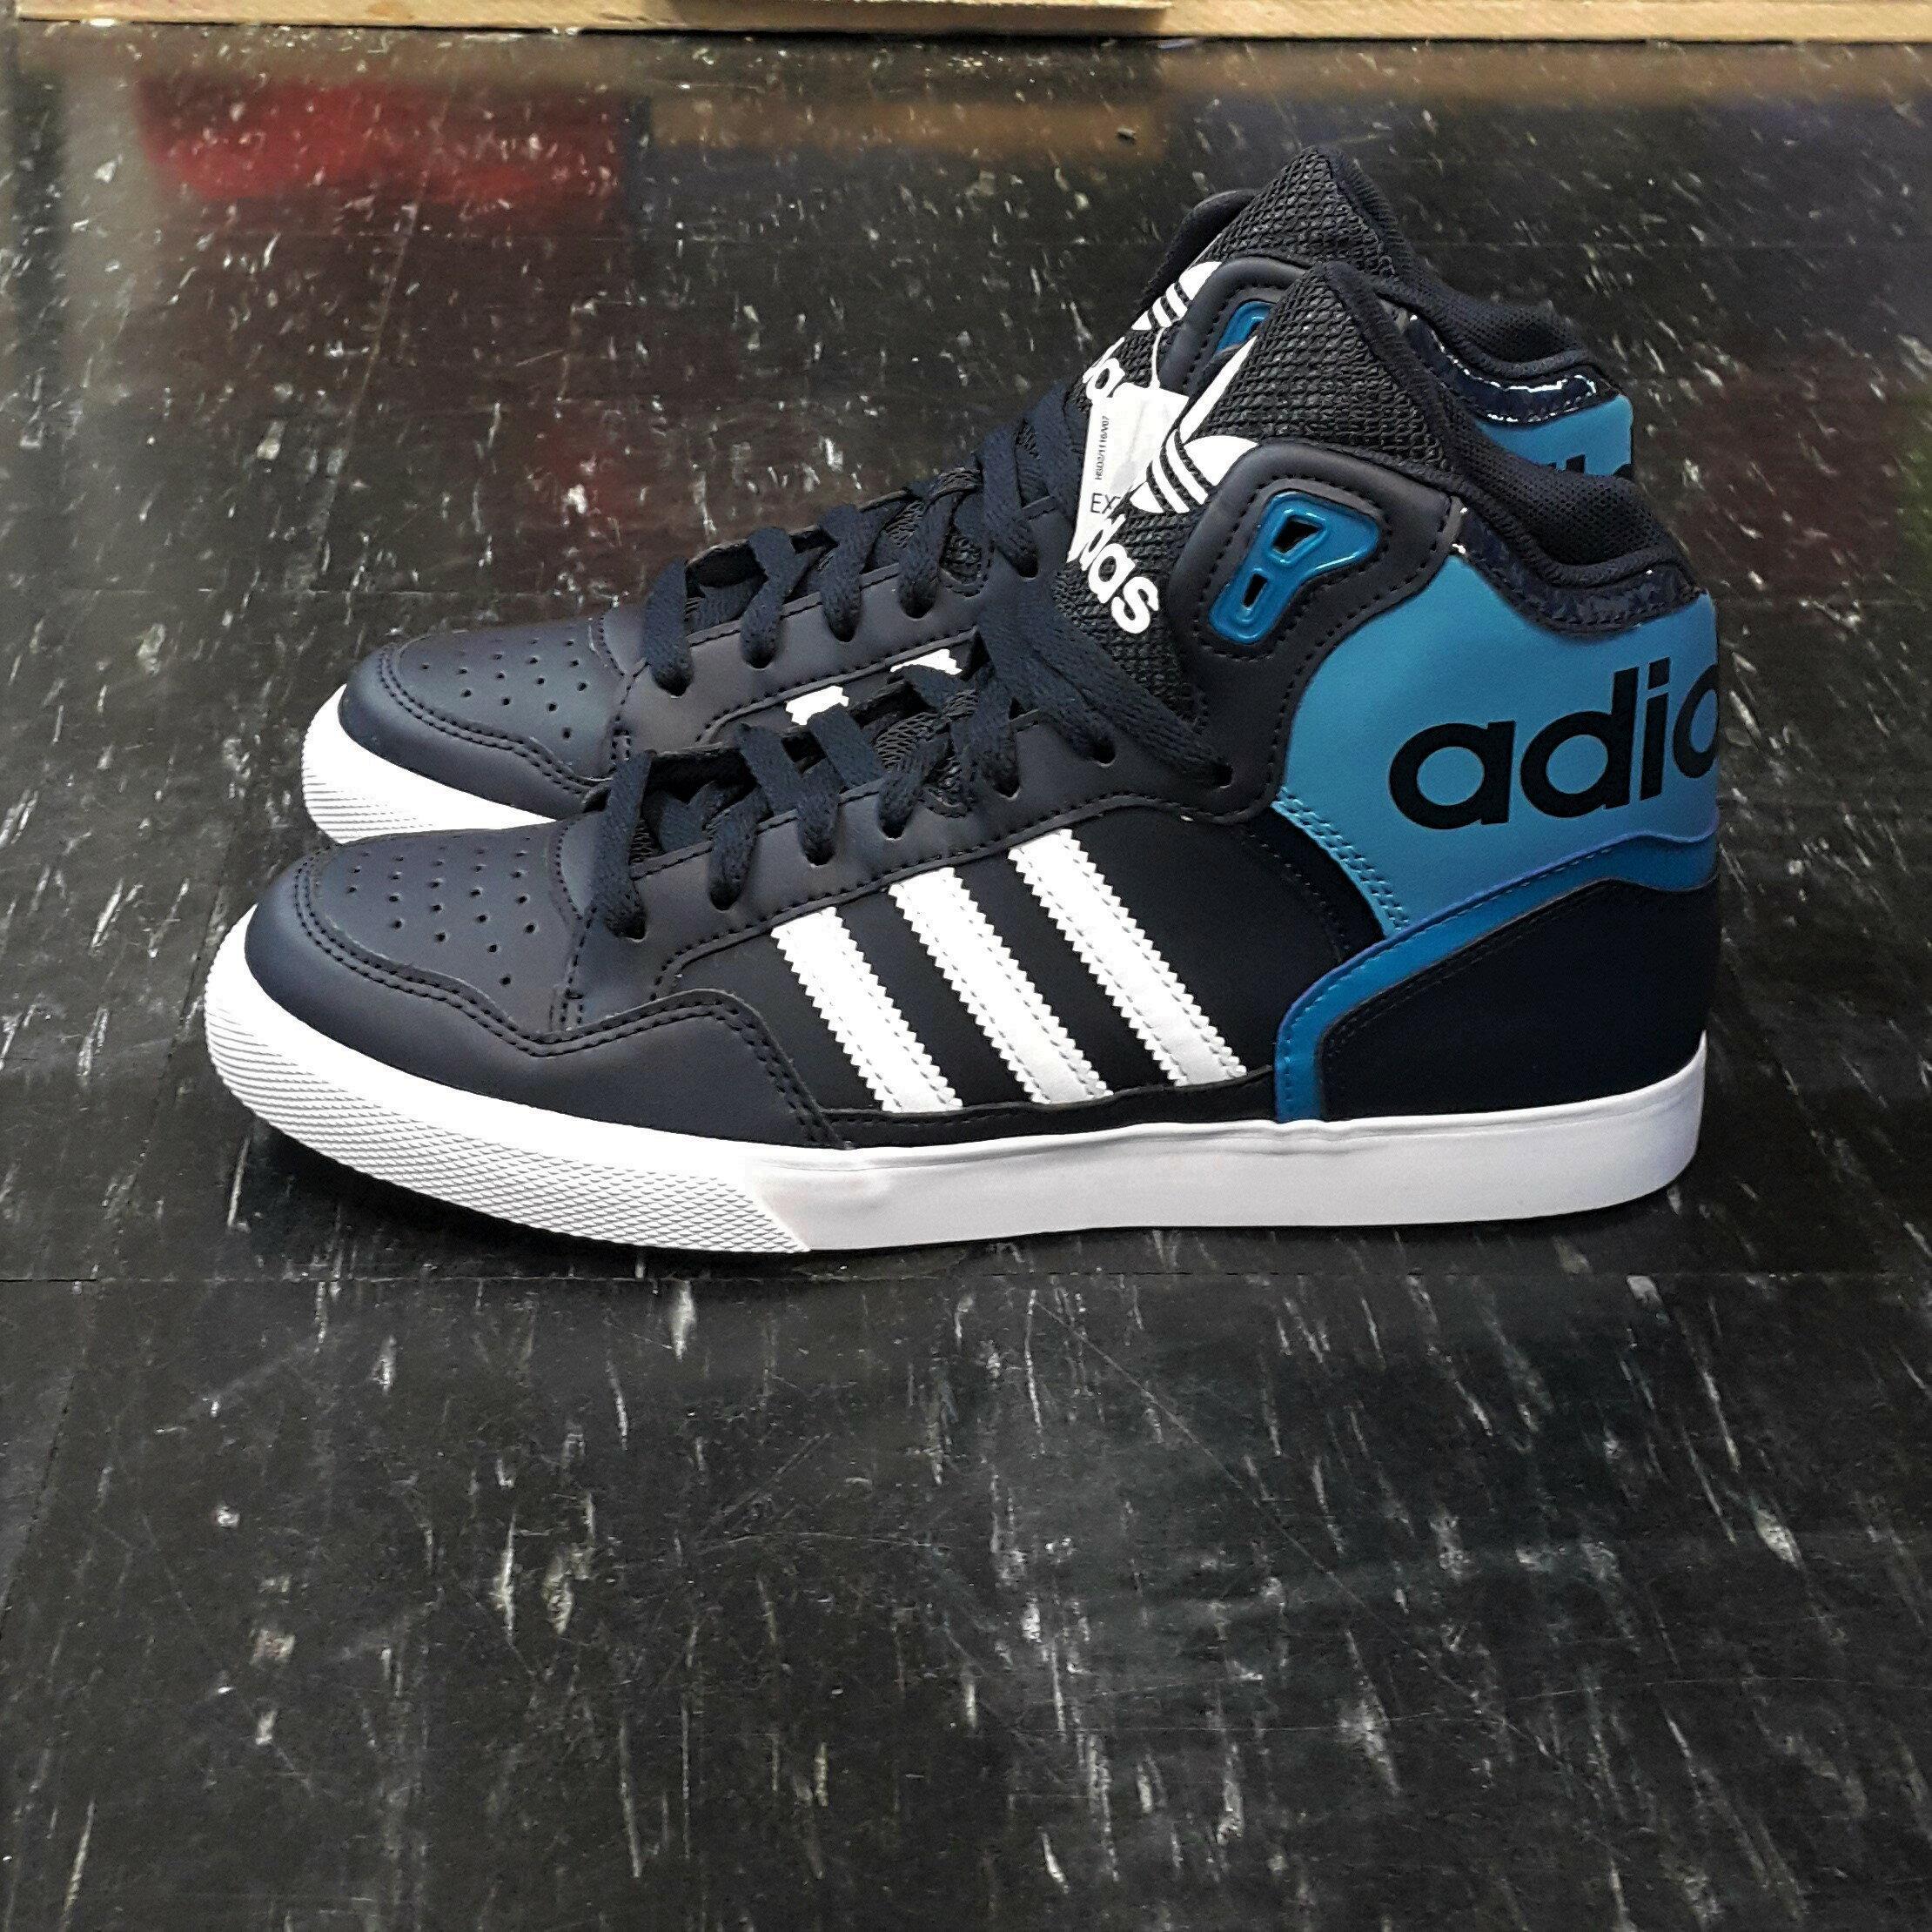 adidas EXTABALL W 高筒 大鞋舌 藍色 深藍色 淺藍色 皮革 CP9624